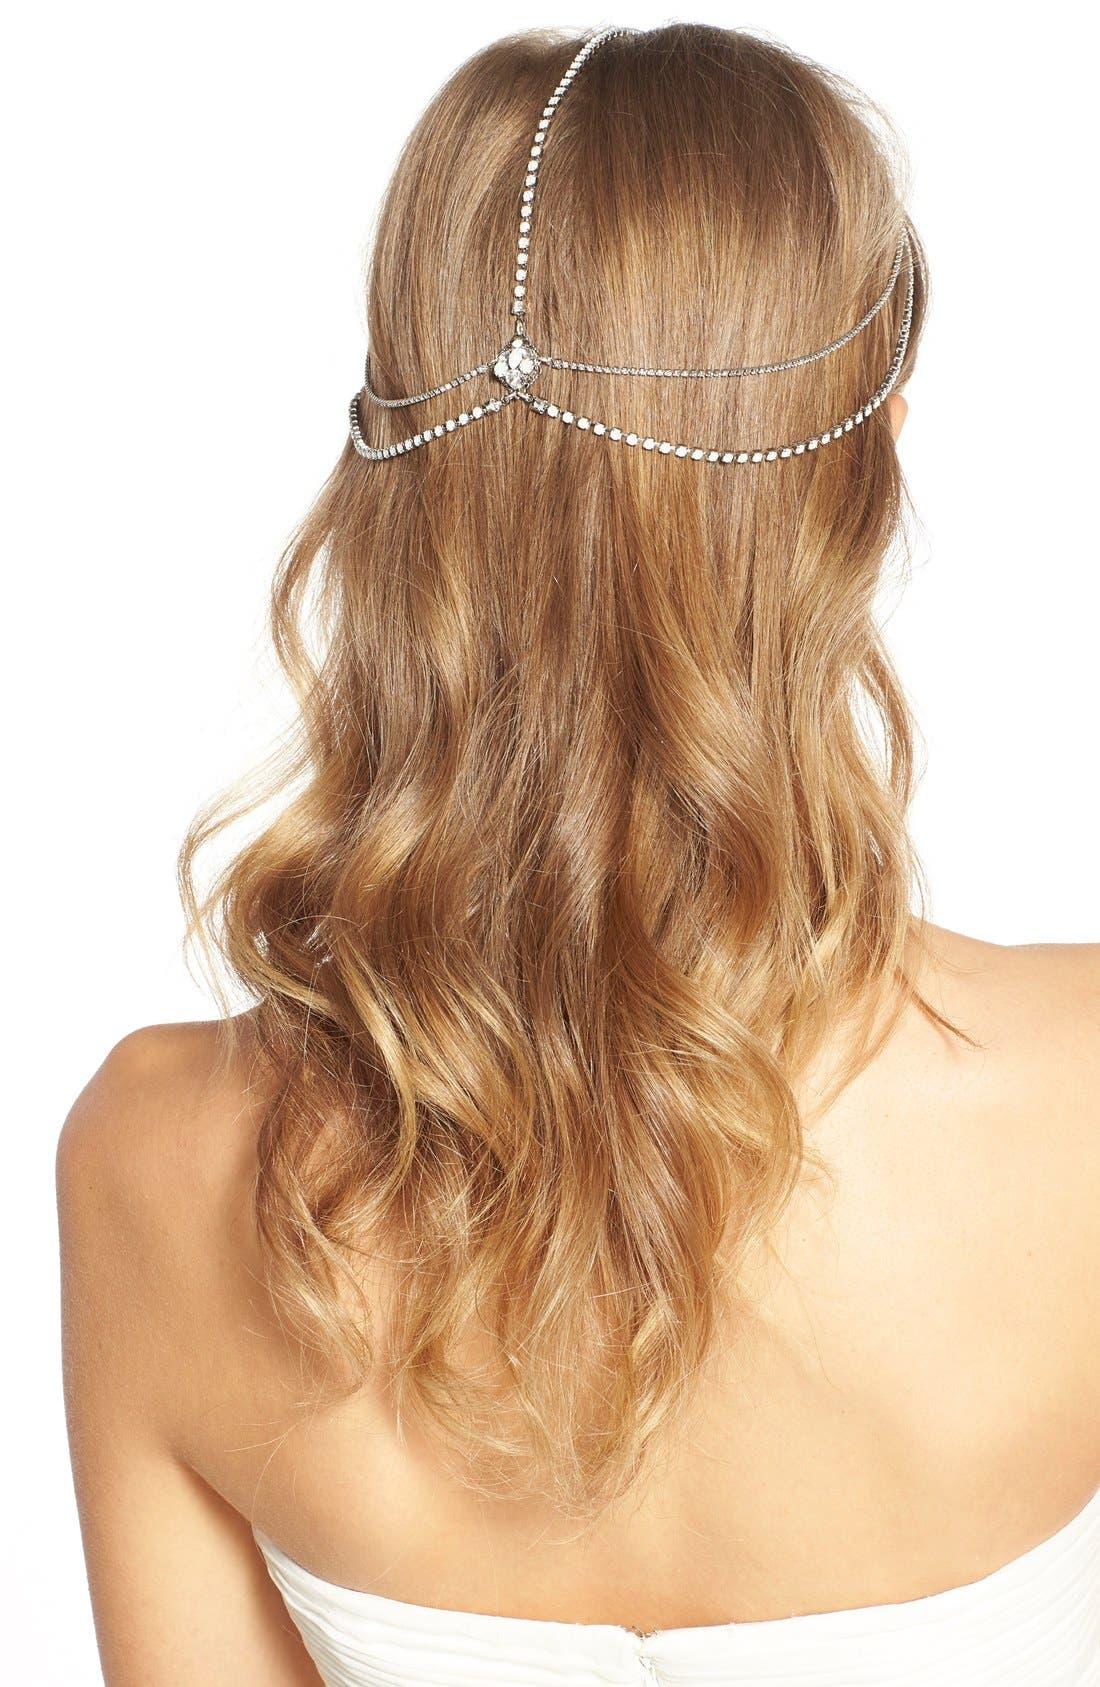 'Lindsay' Embellished Hair Chain,                             Alternate thumbnail 4, color,